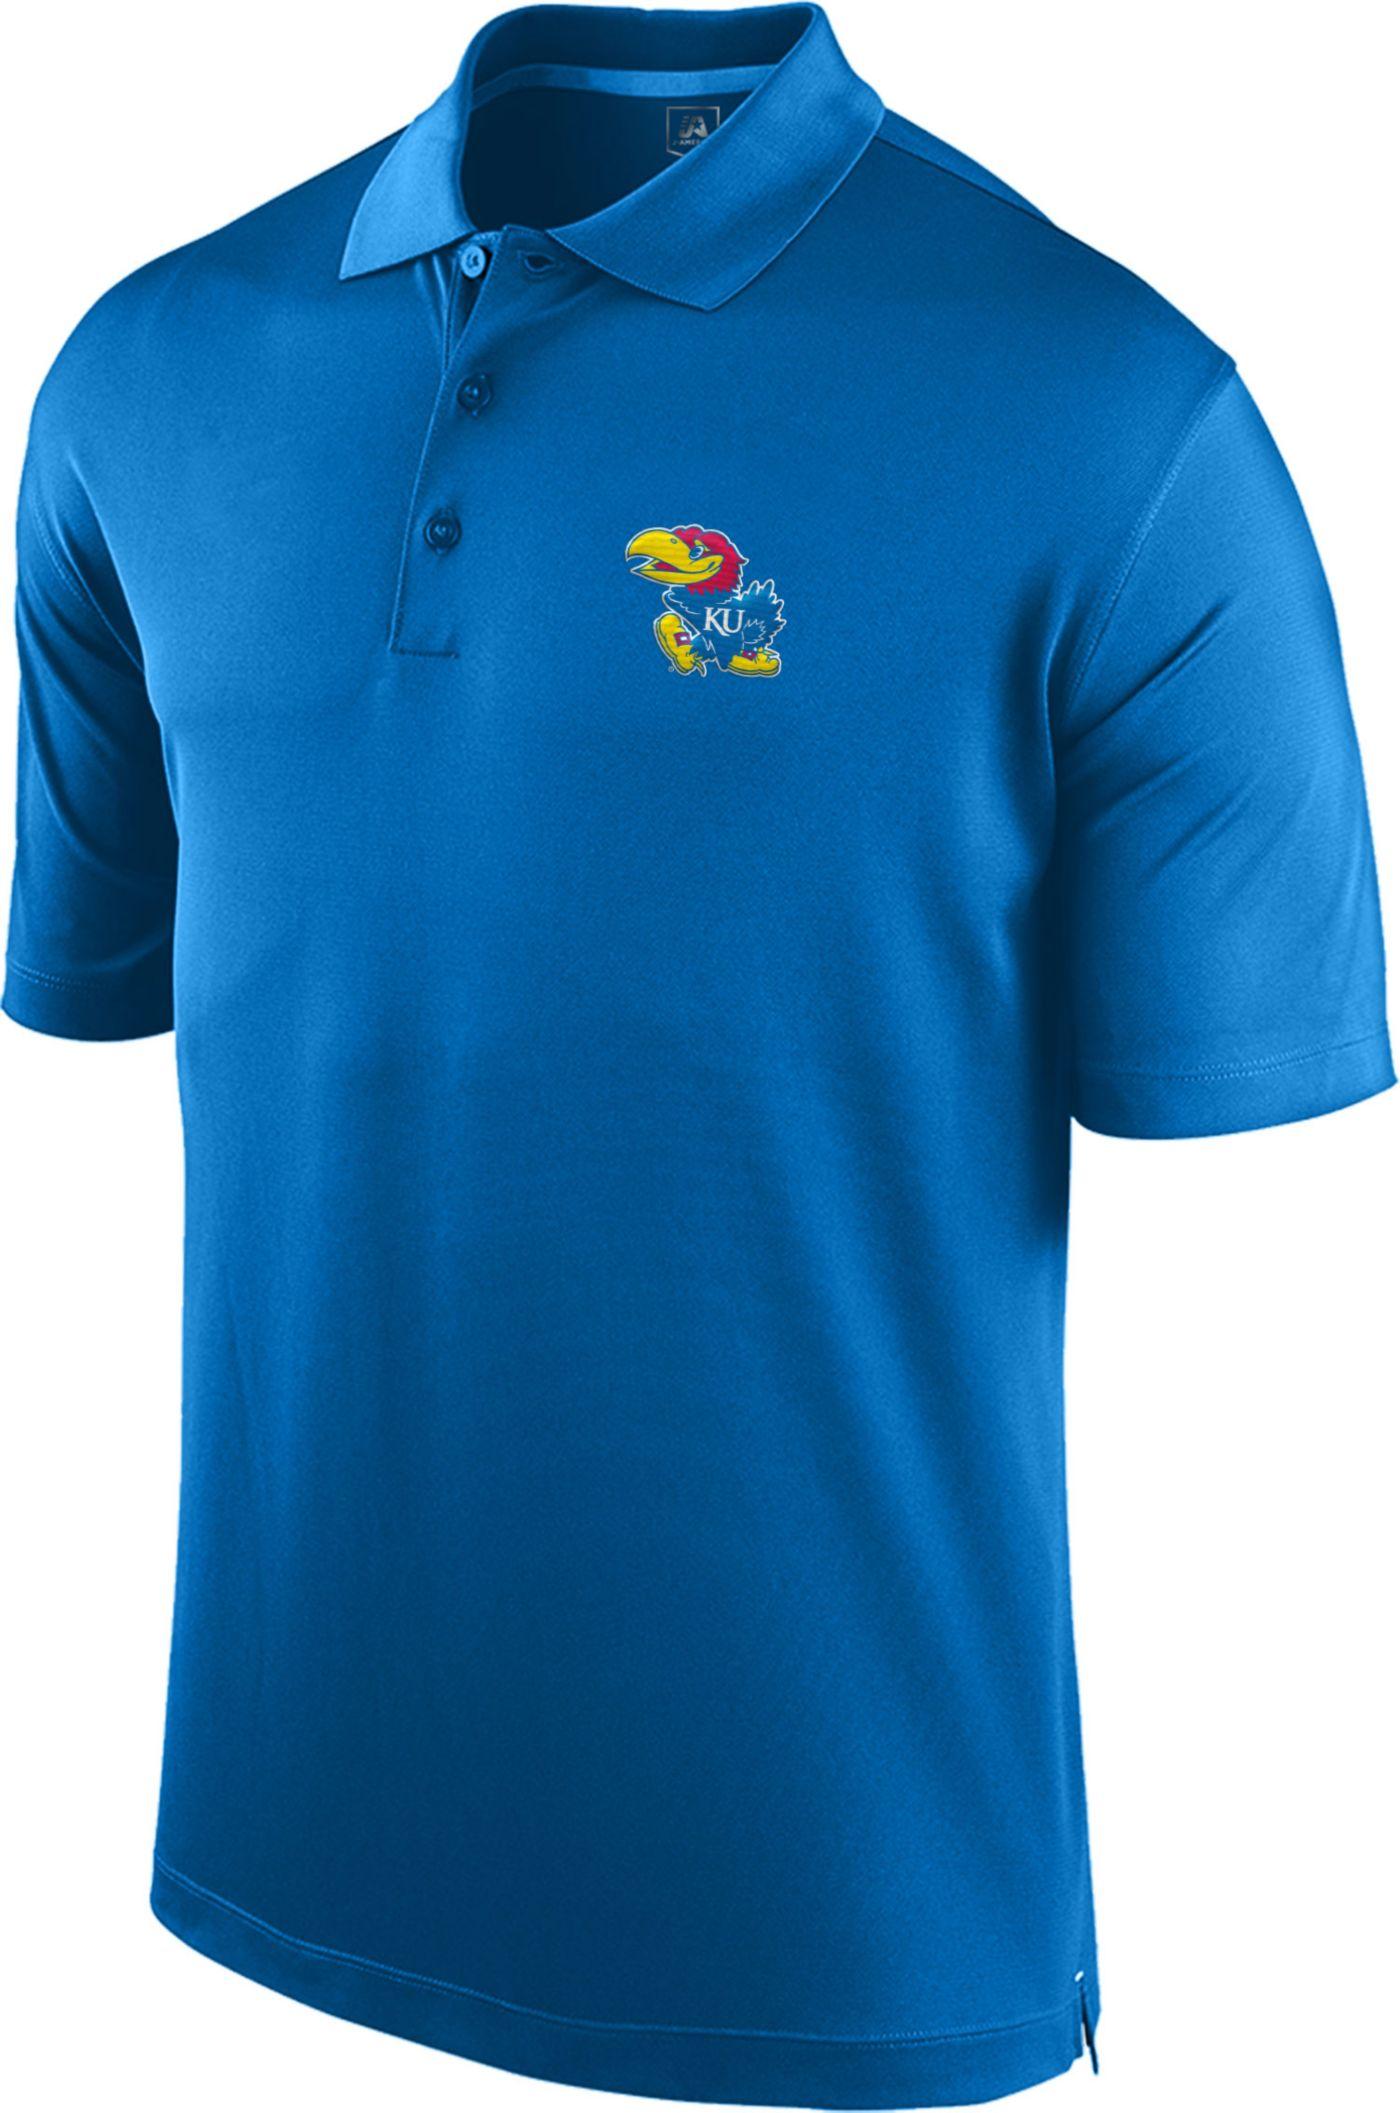 Top of the World Men's Kansas Jayhawks Blue Spector Polo